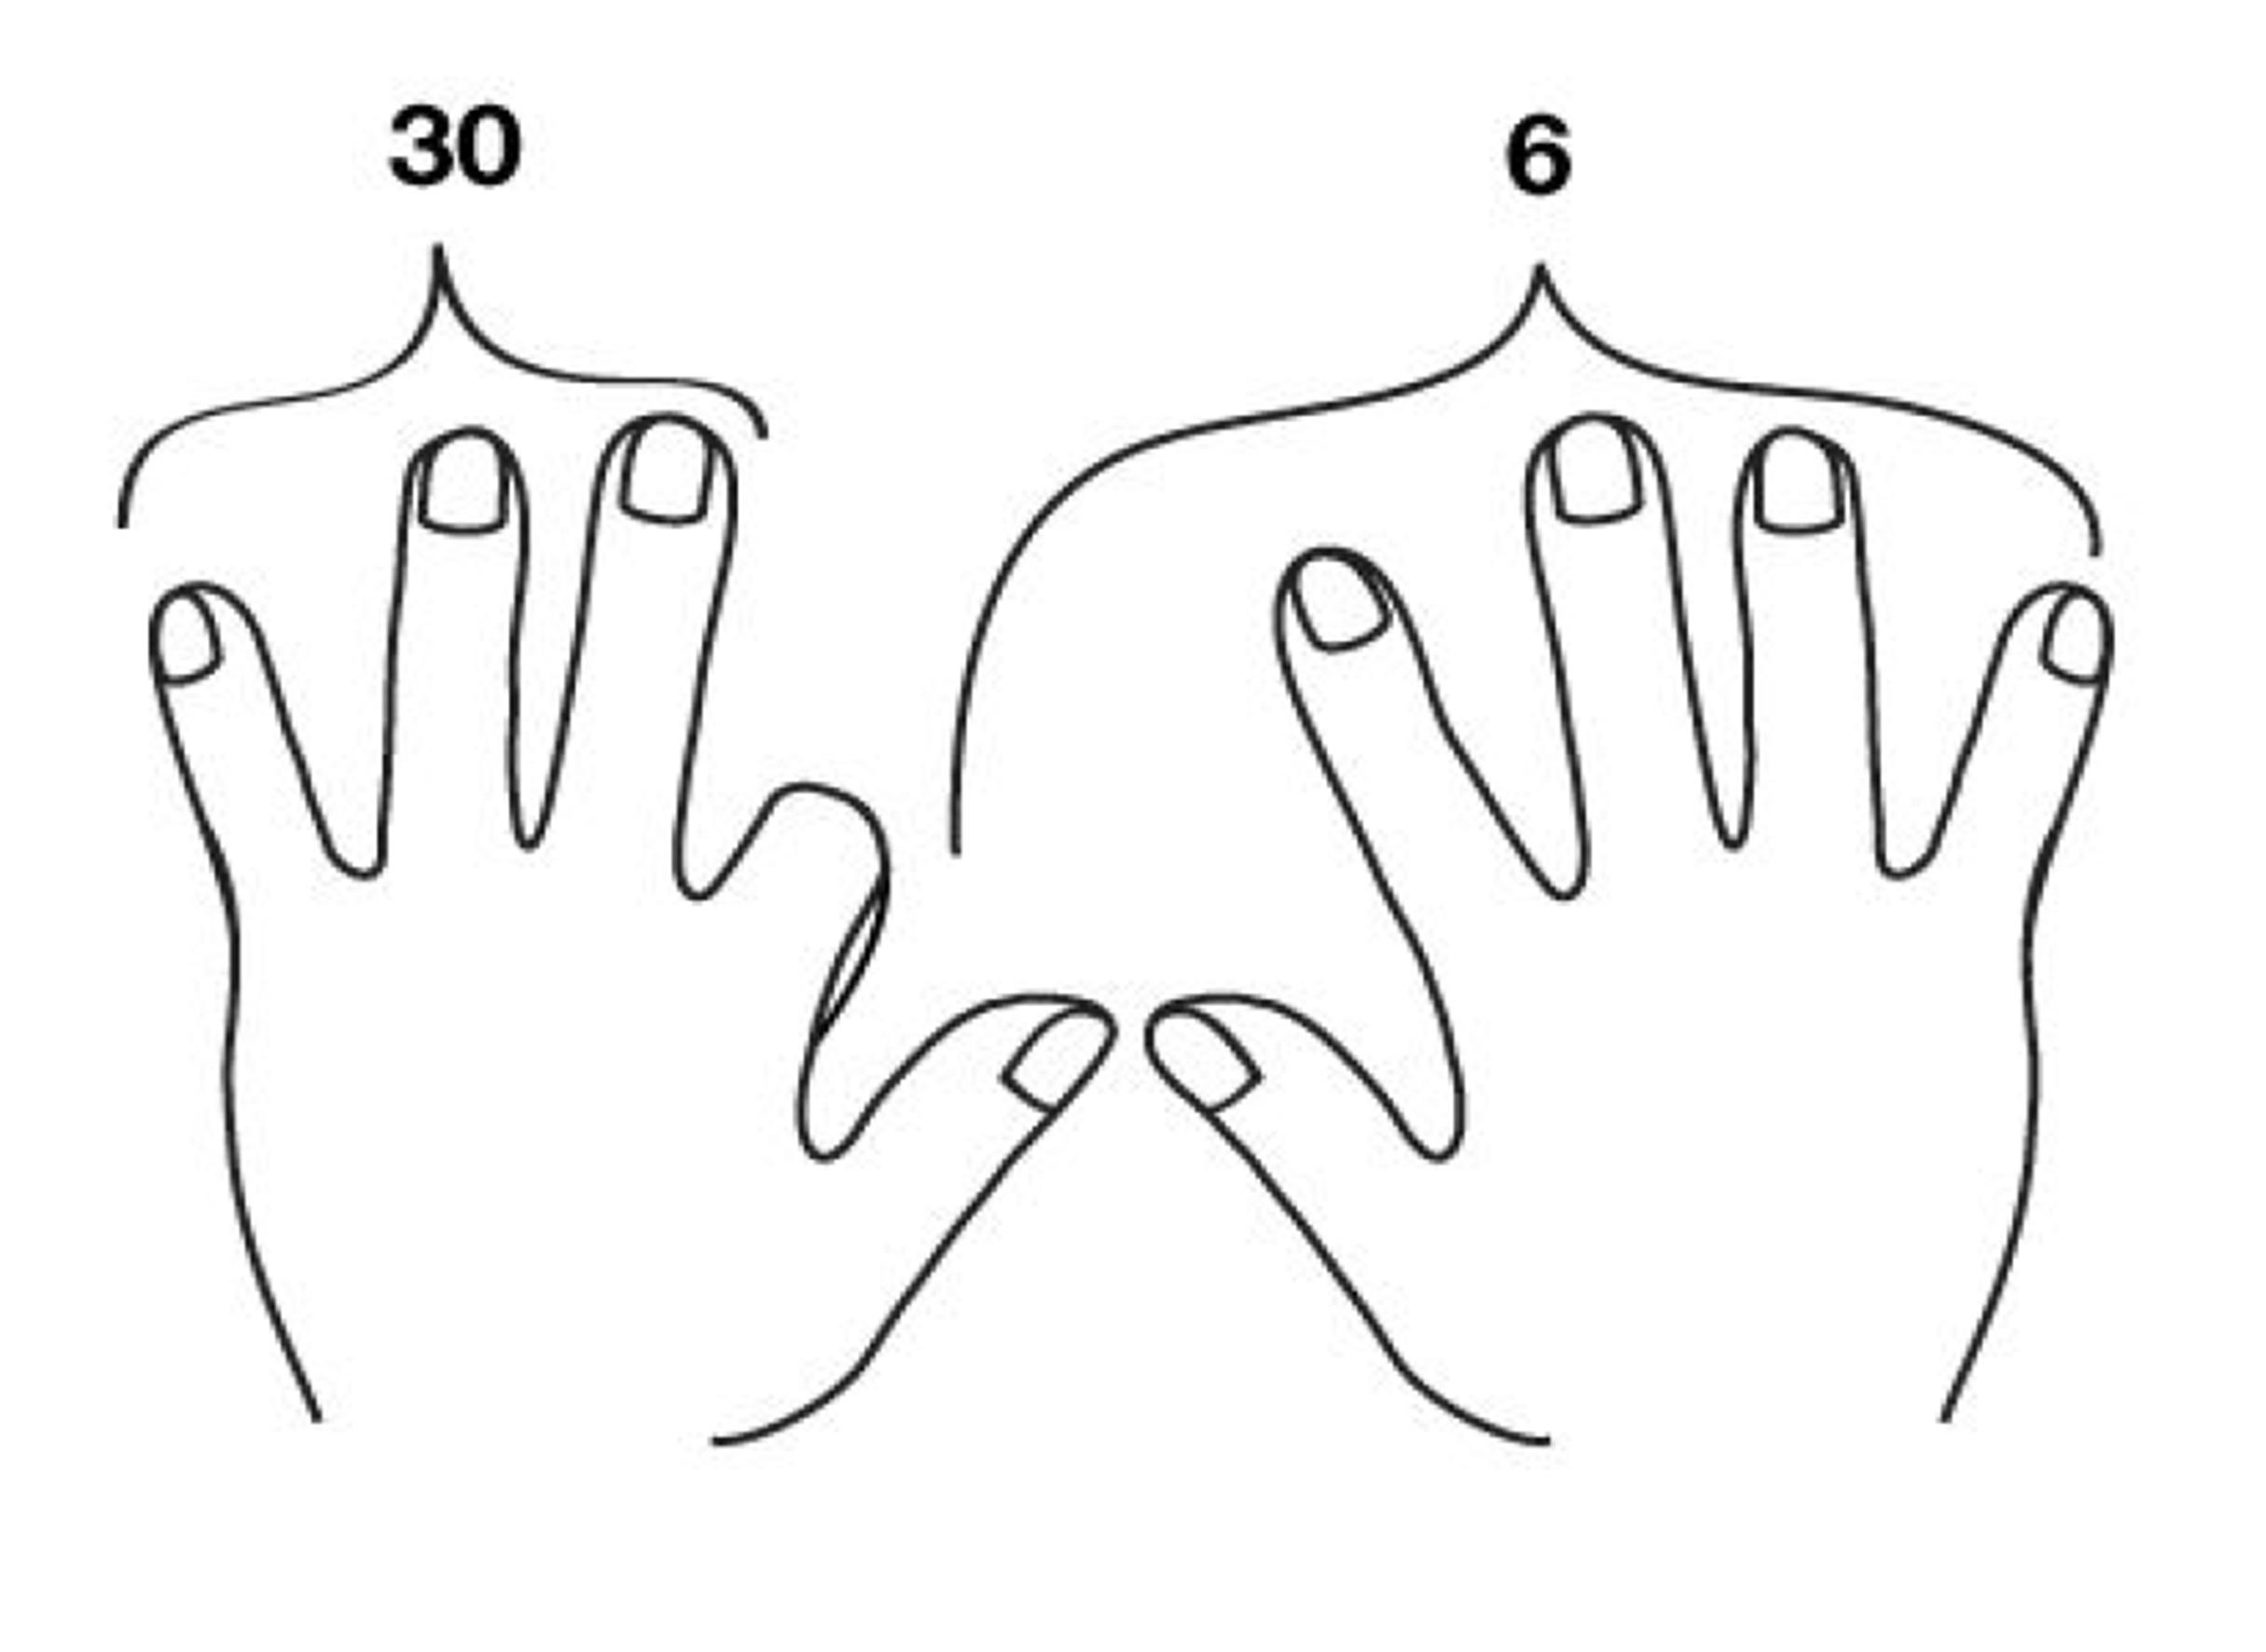 Parmaklarla kolay 9 çarpım tablosu